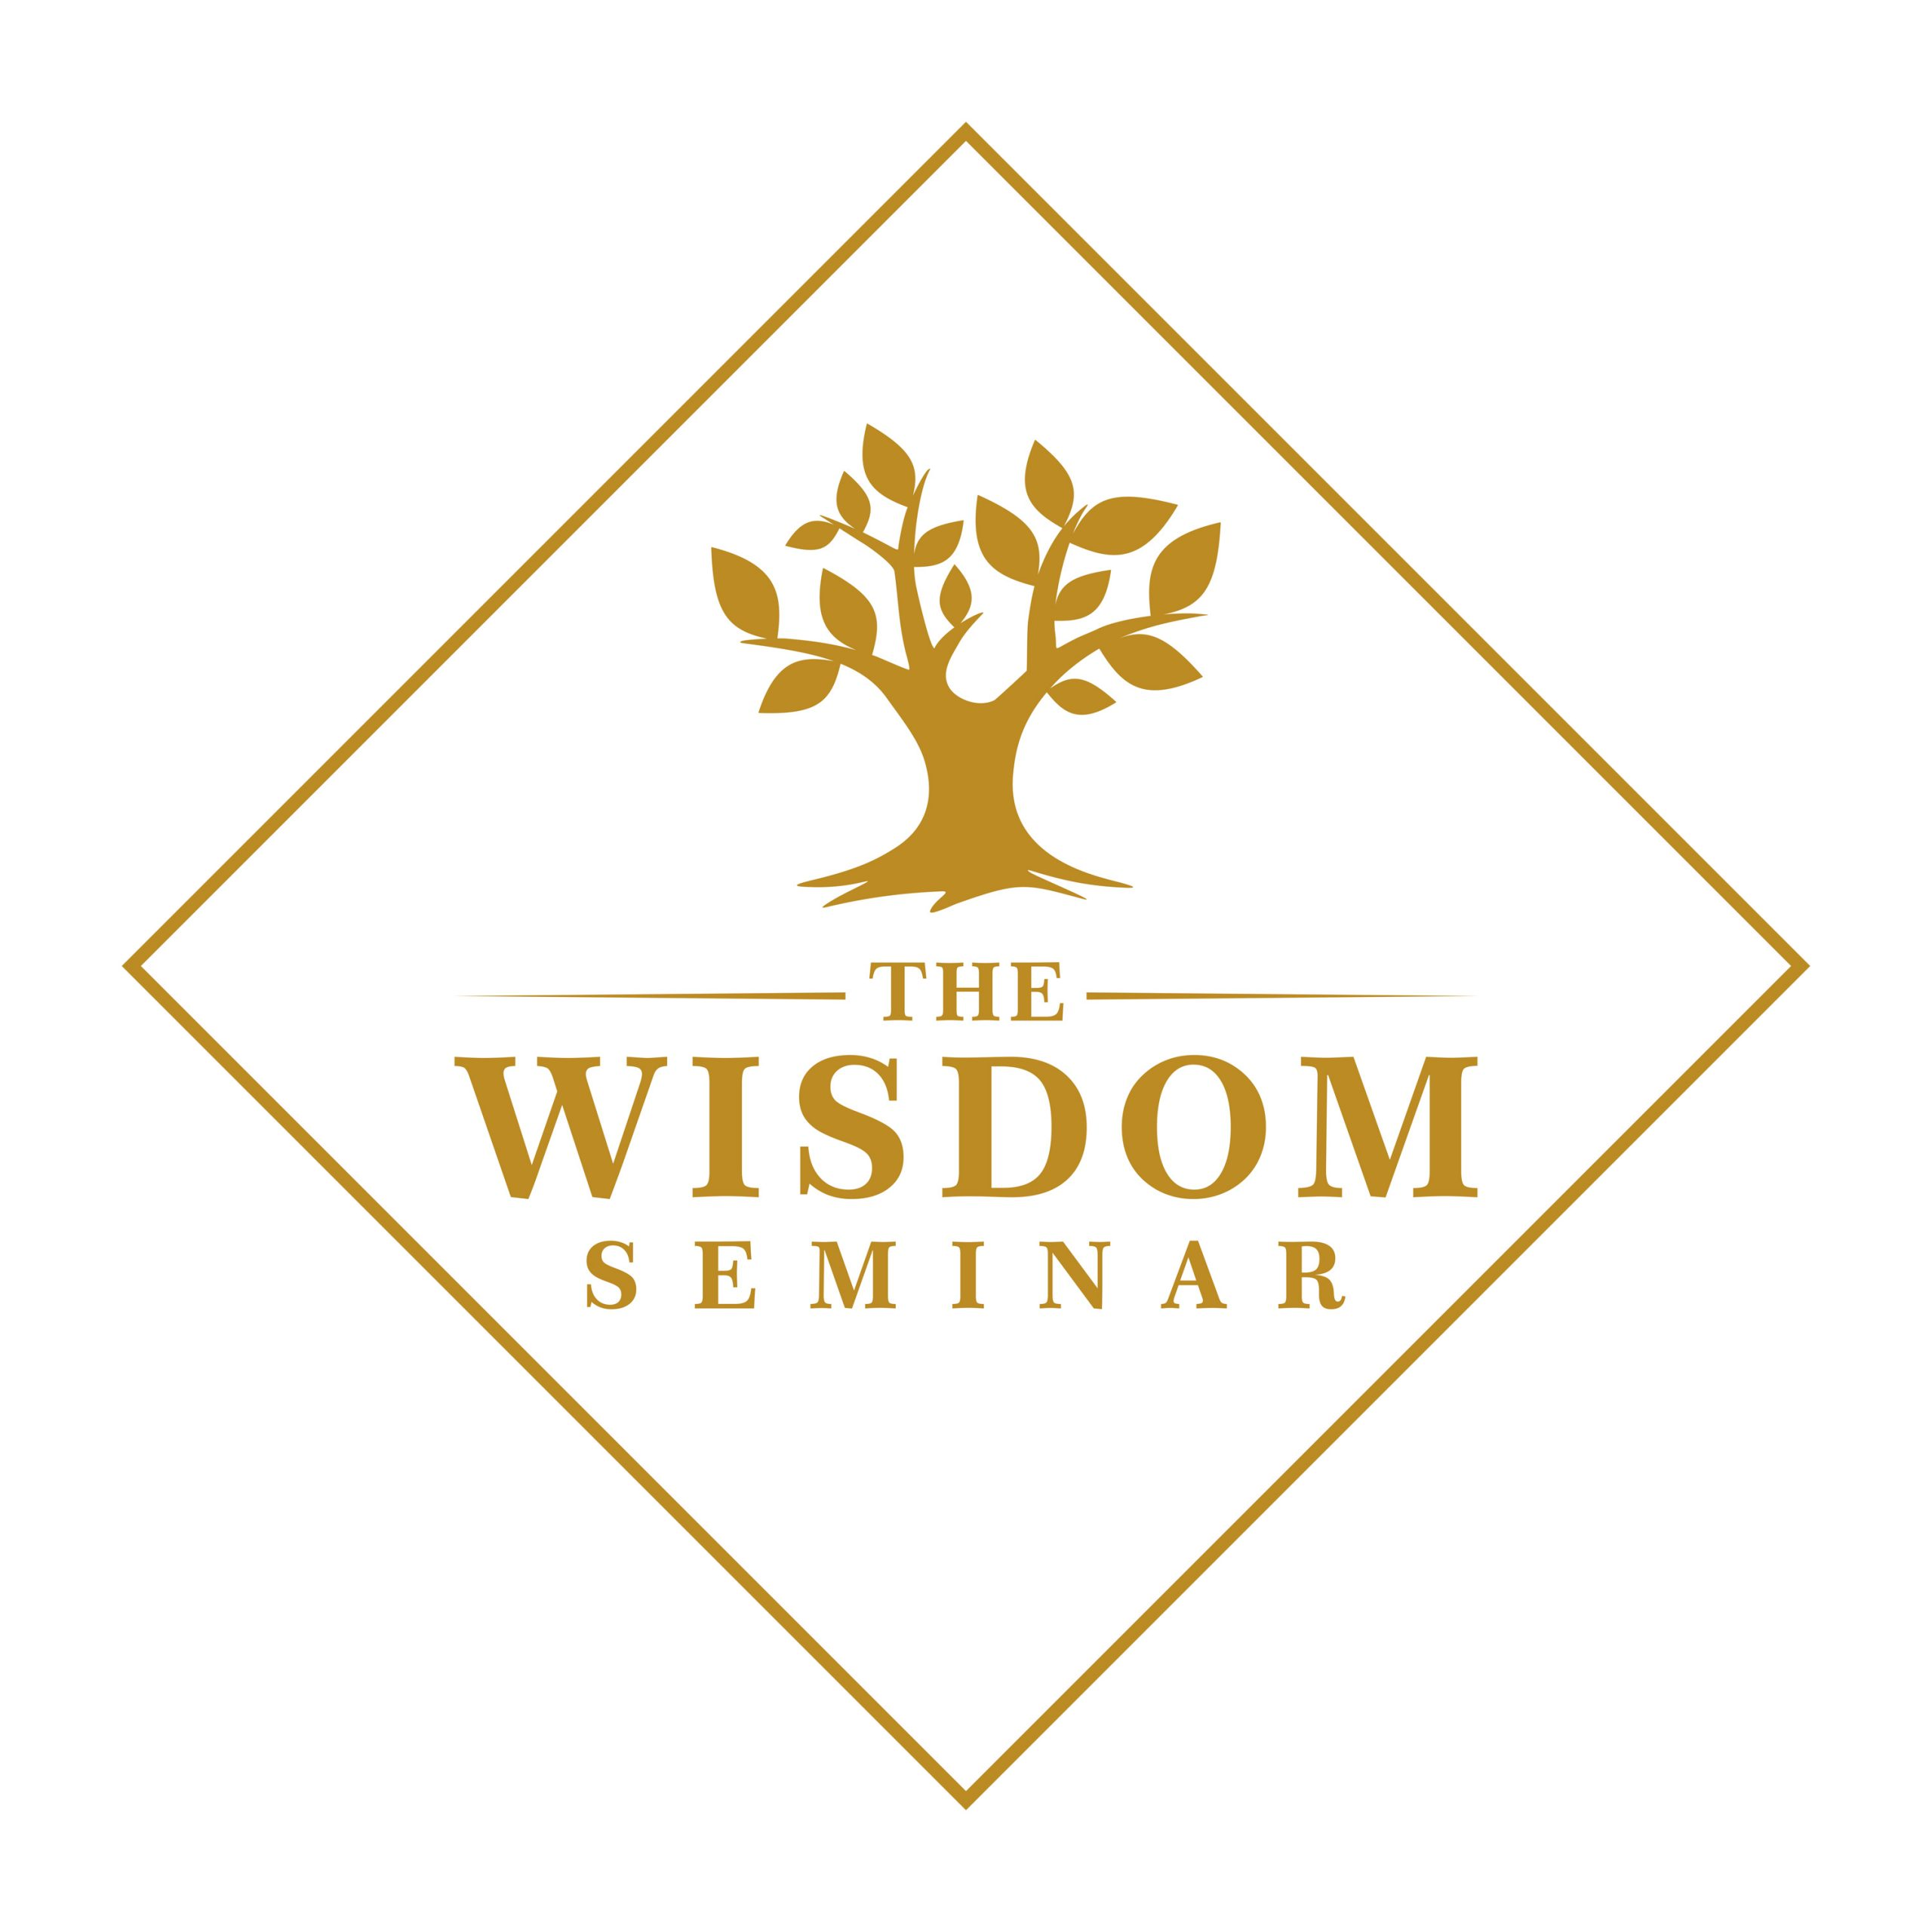 The Wisdom Seminar